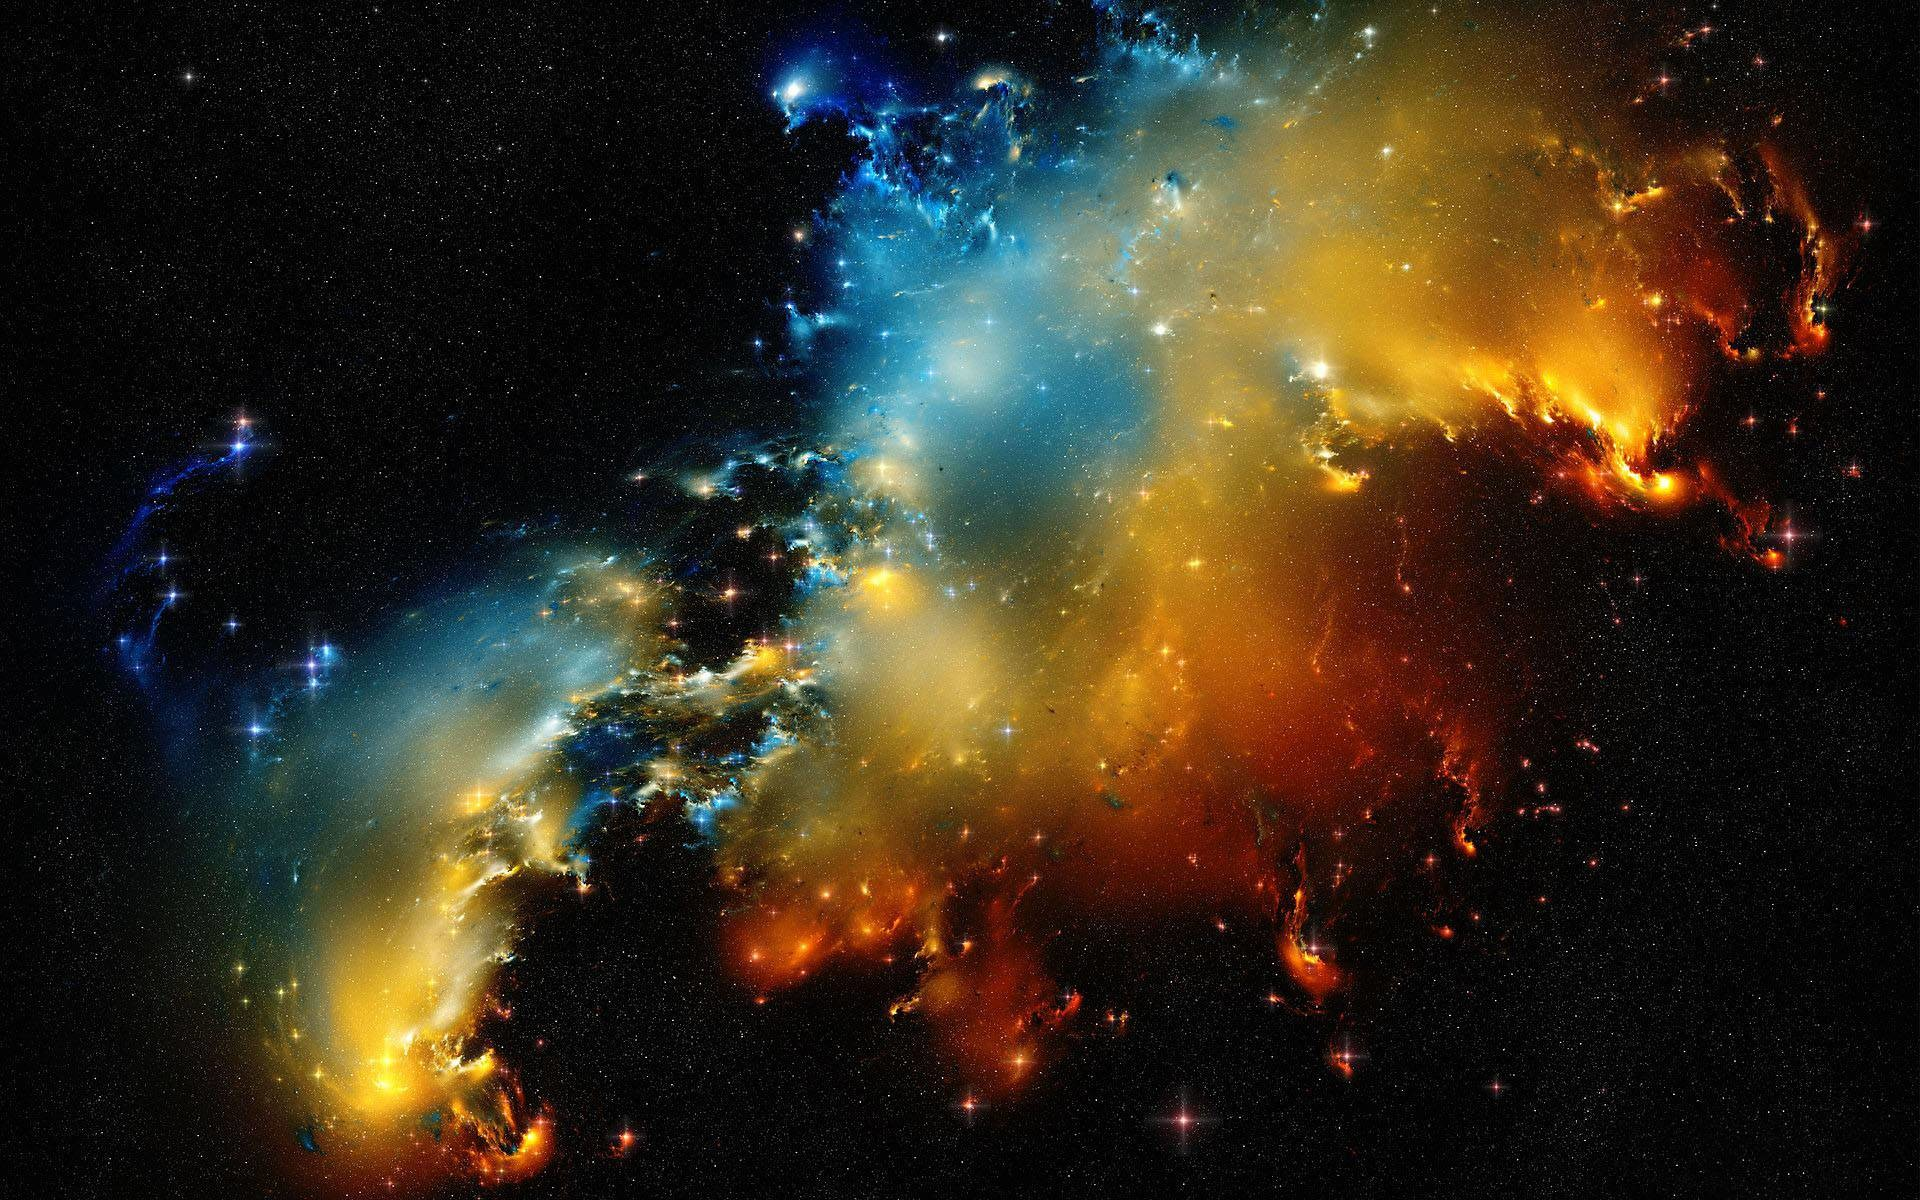 NASA Wallpaper | Most Amazing Space